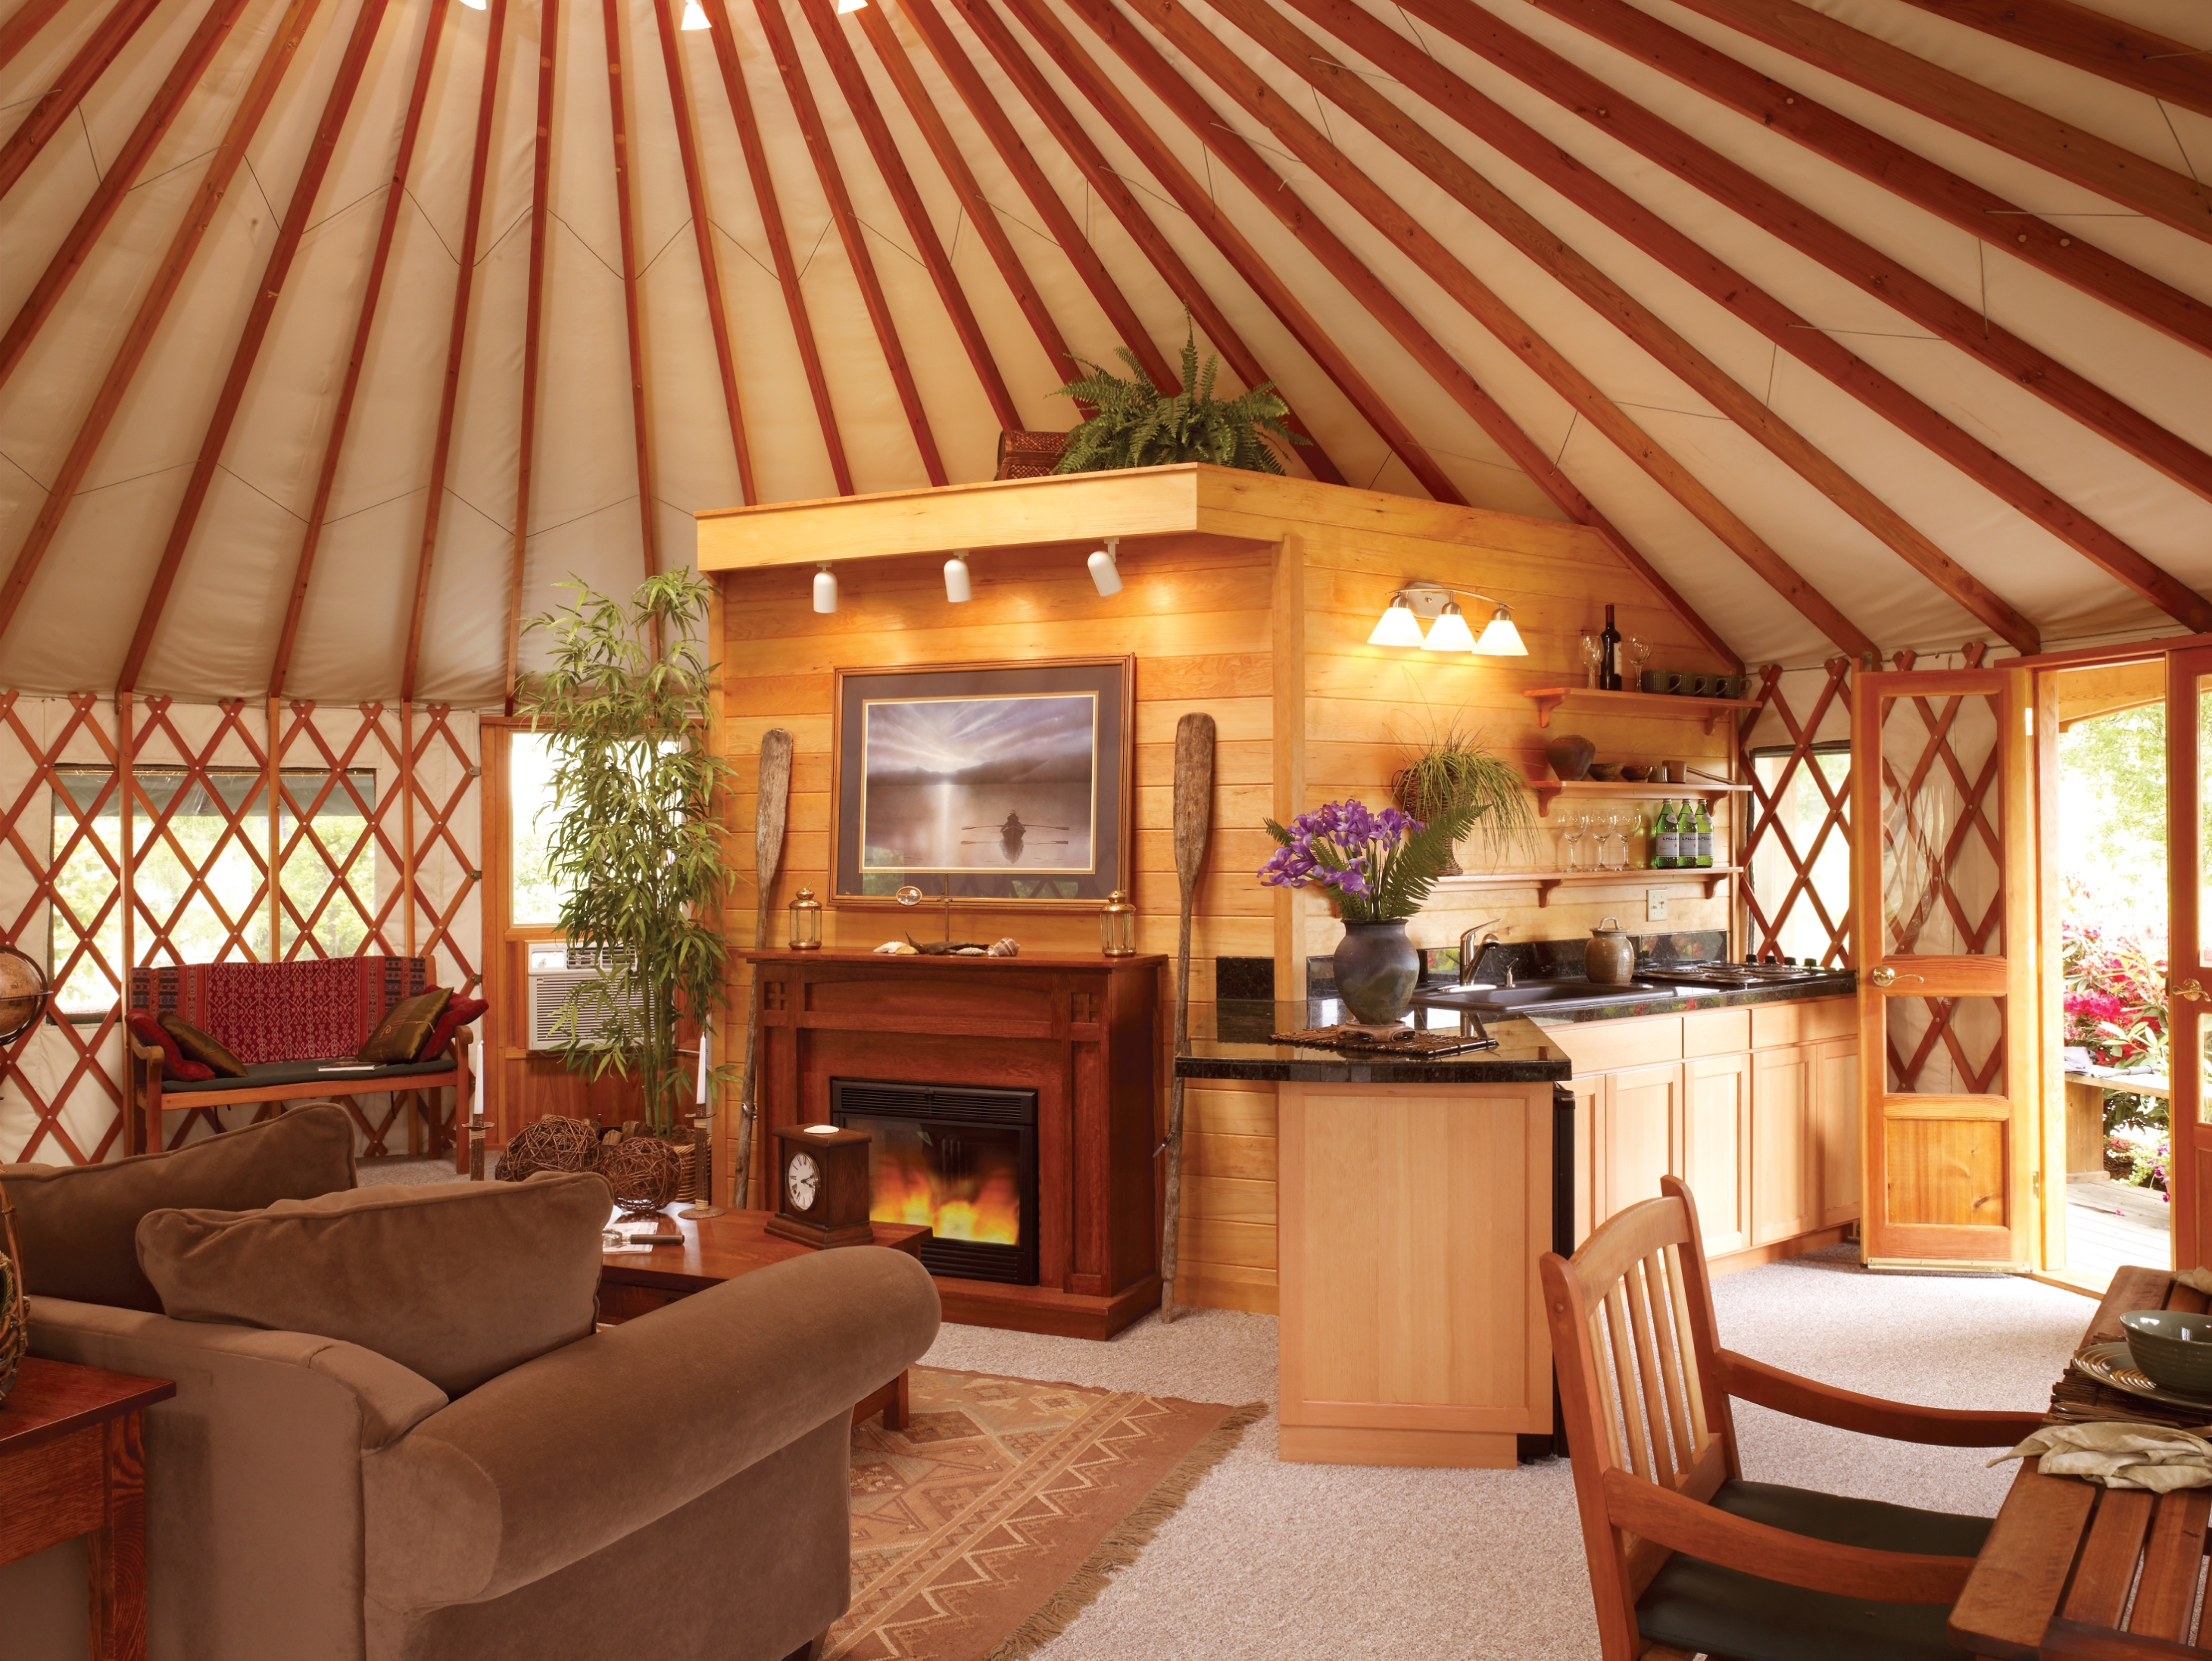 Luxurious Pacific Yurt Interior (Photo: Business Wire)